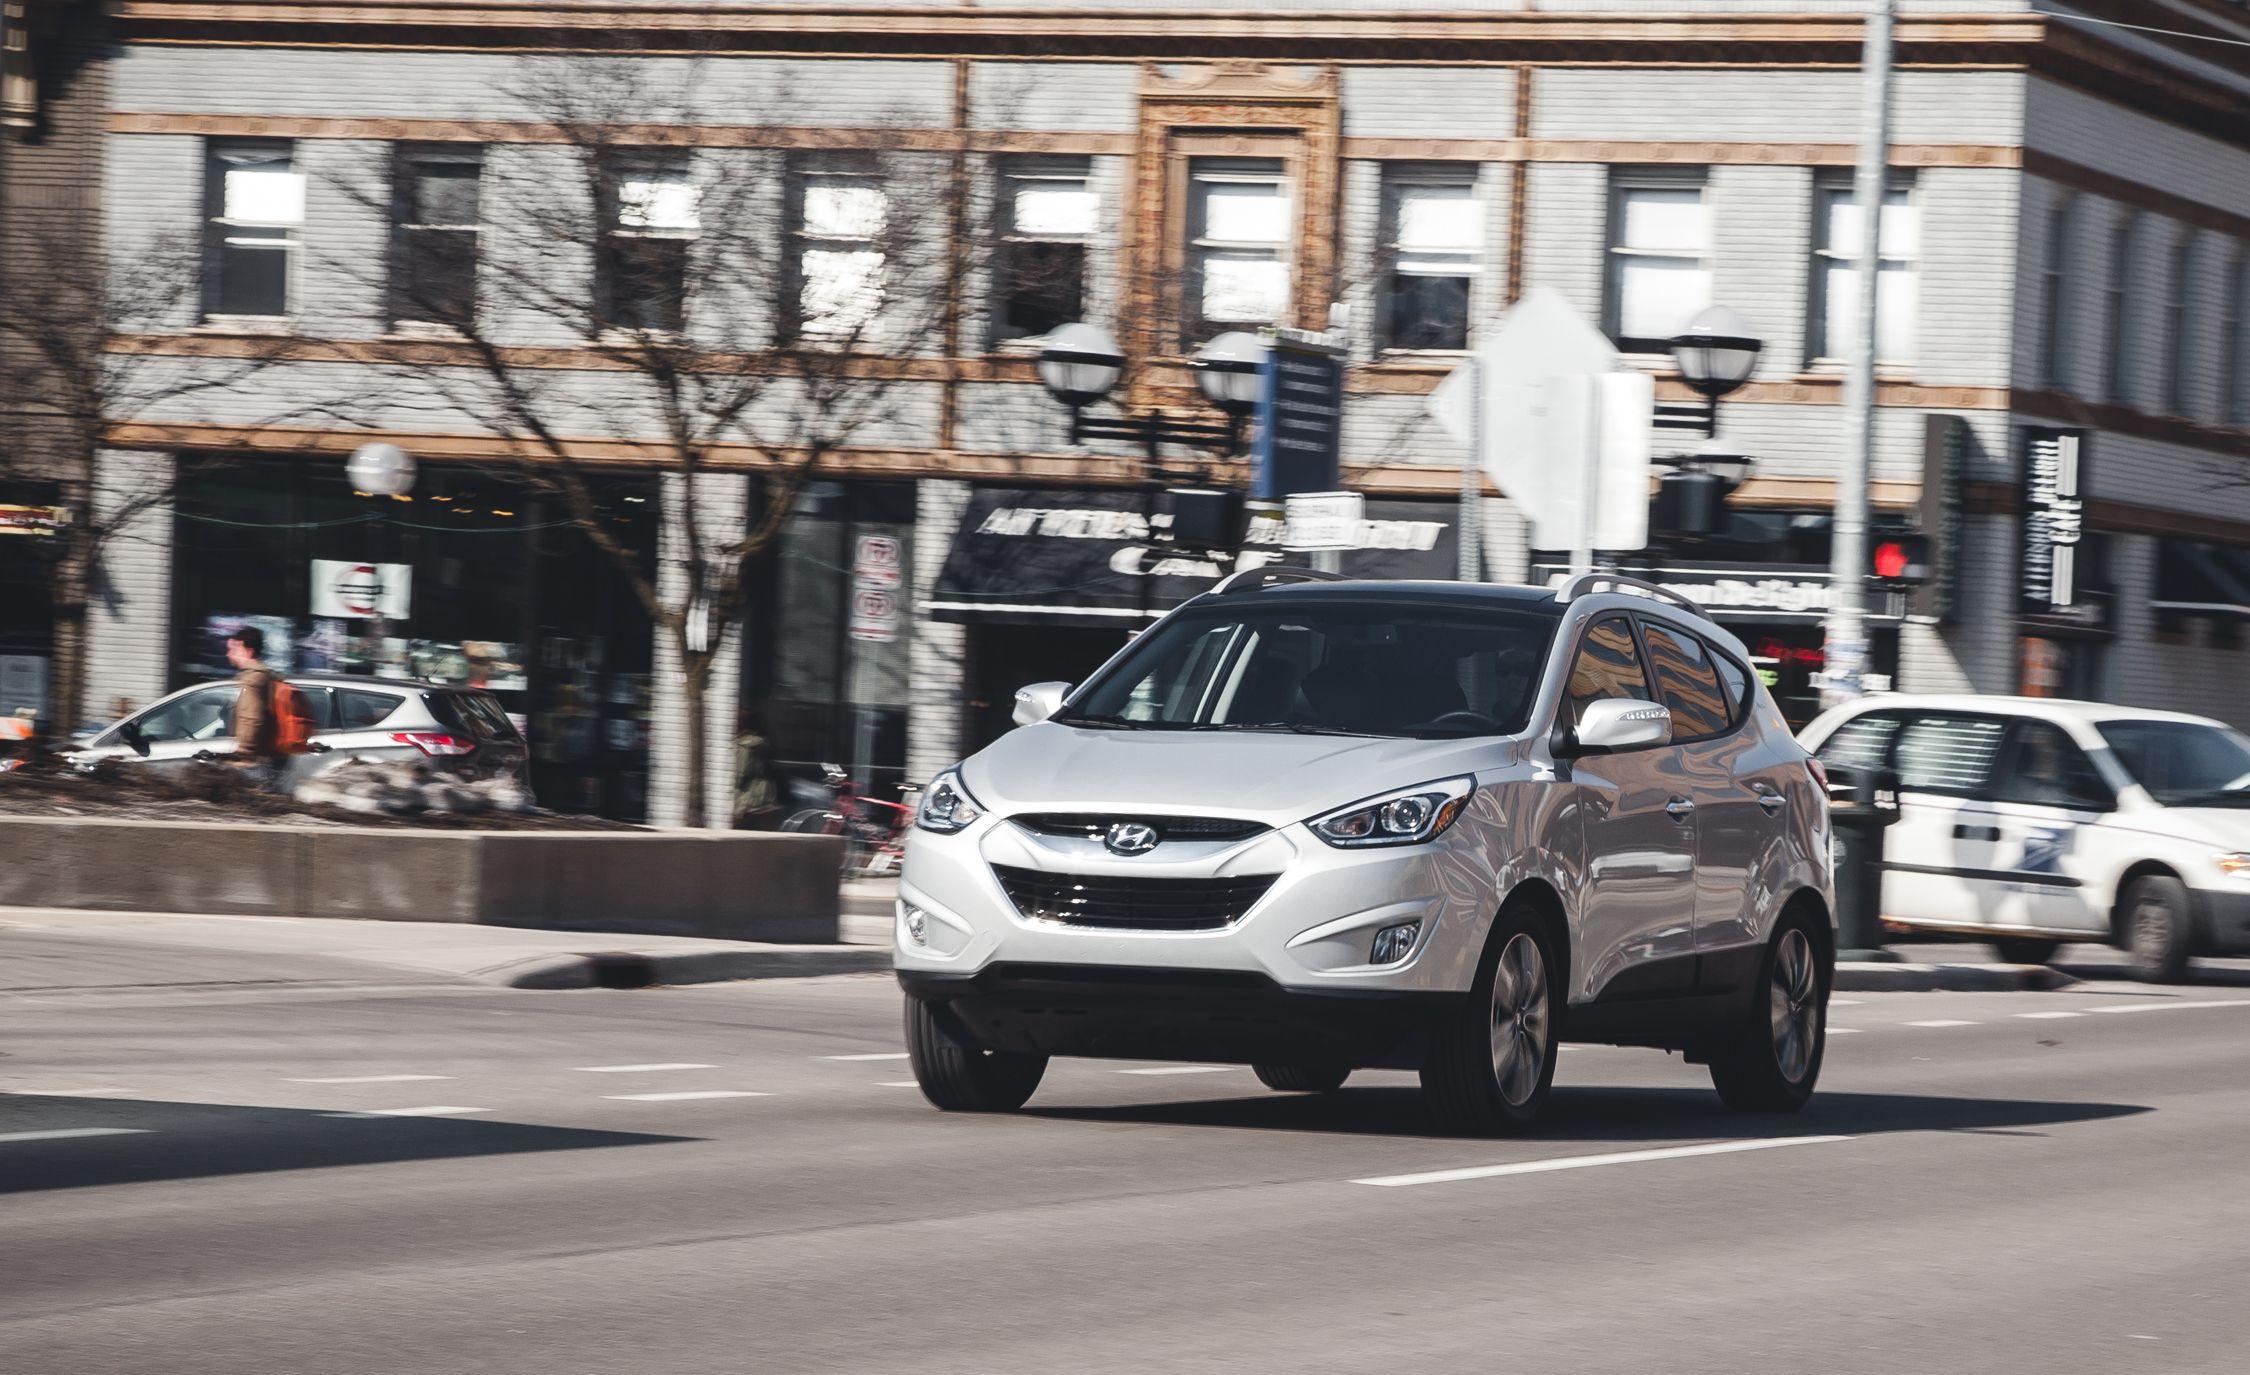 2014 Hyundai Tucson 2.4L FWD